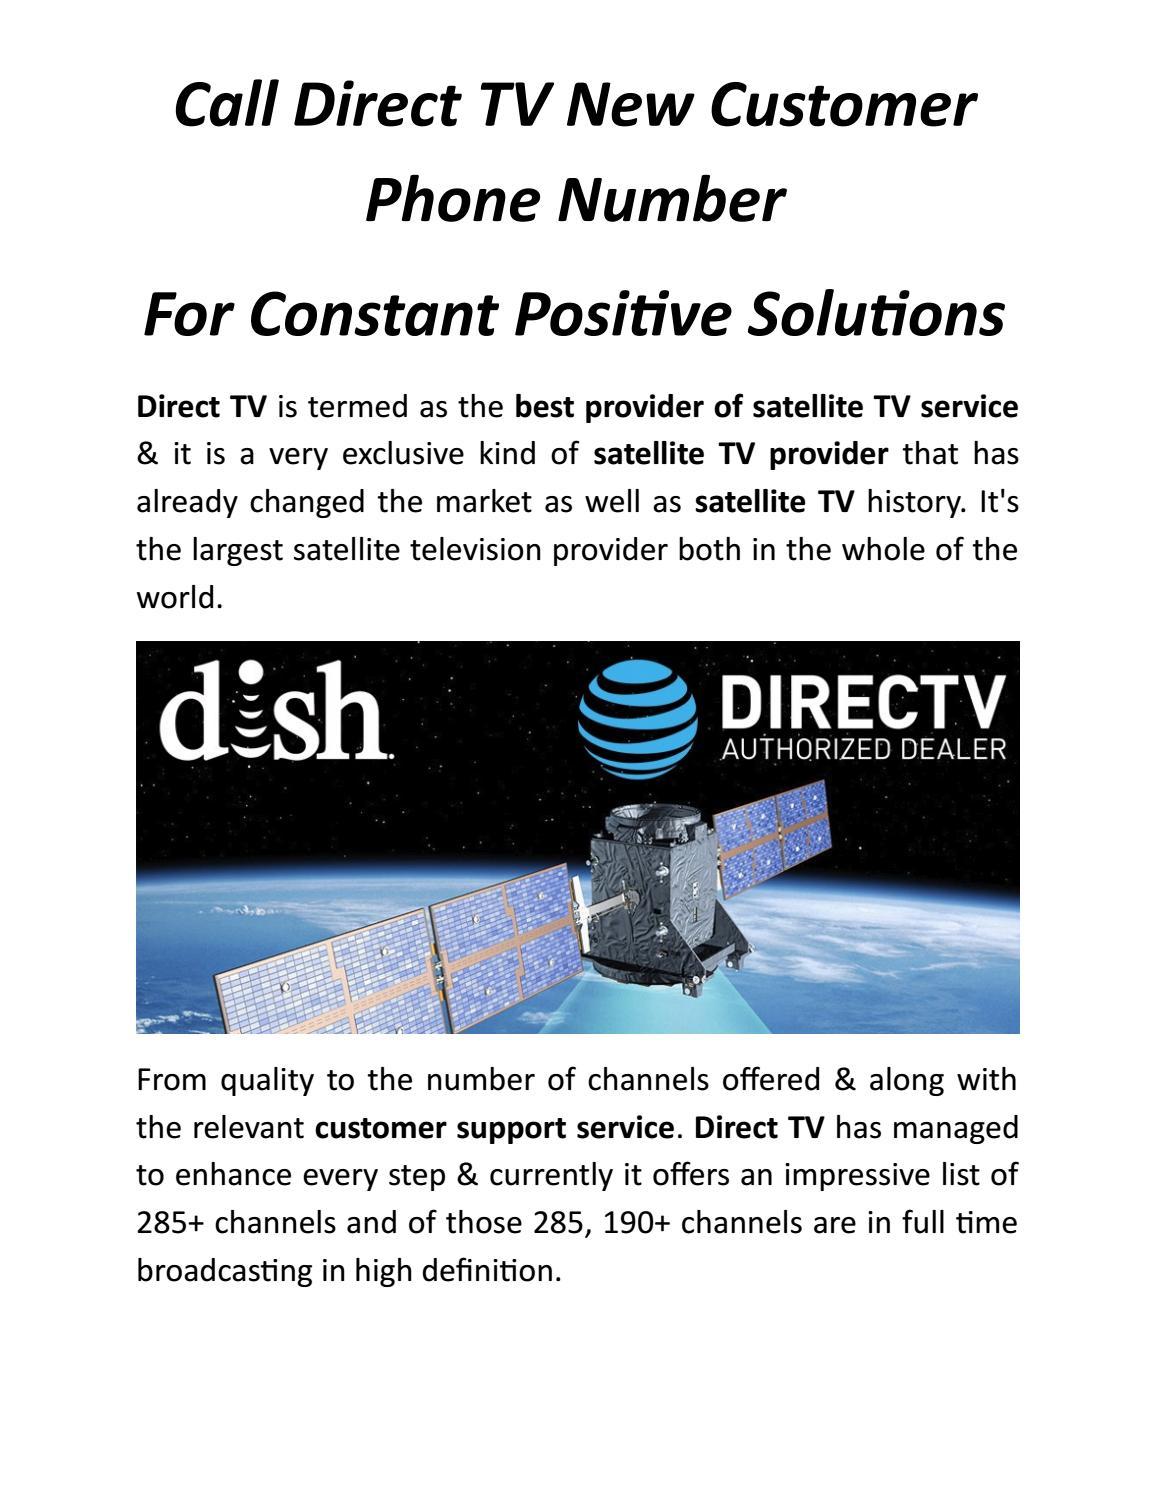 Fresh Direct Phone Number Customer Service